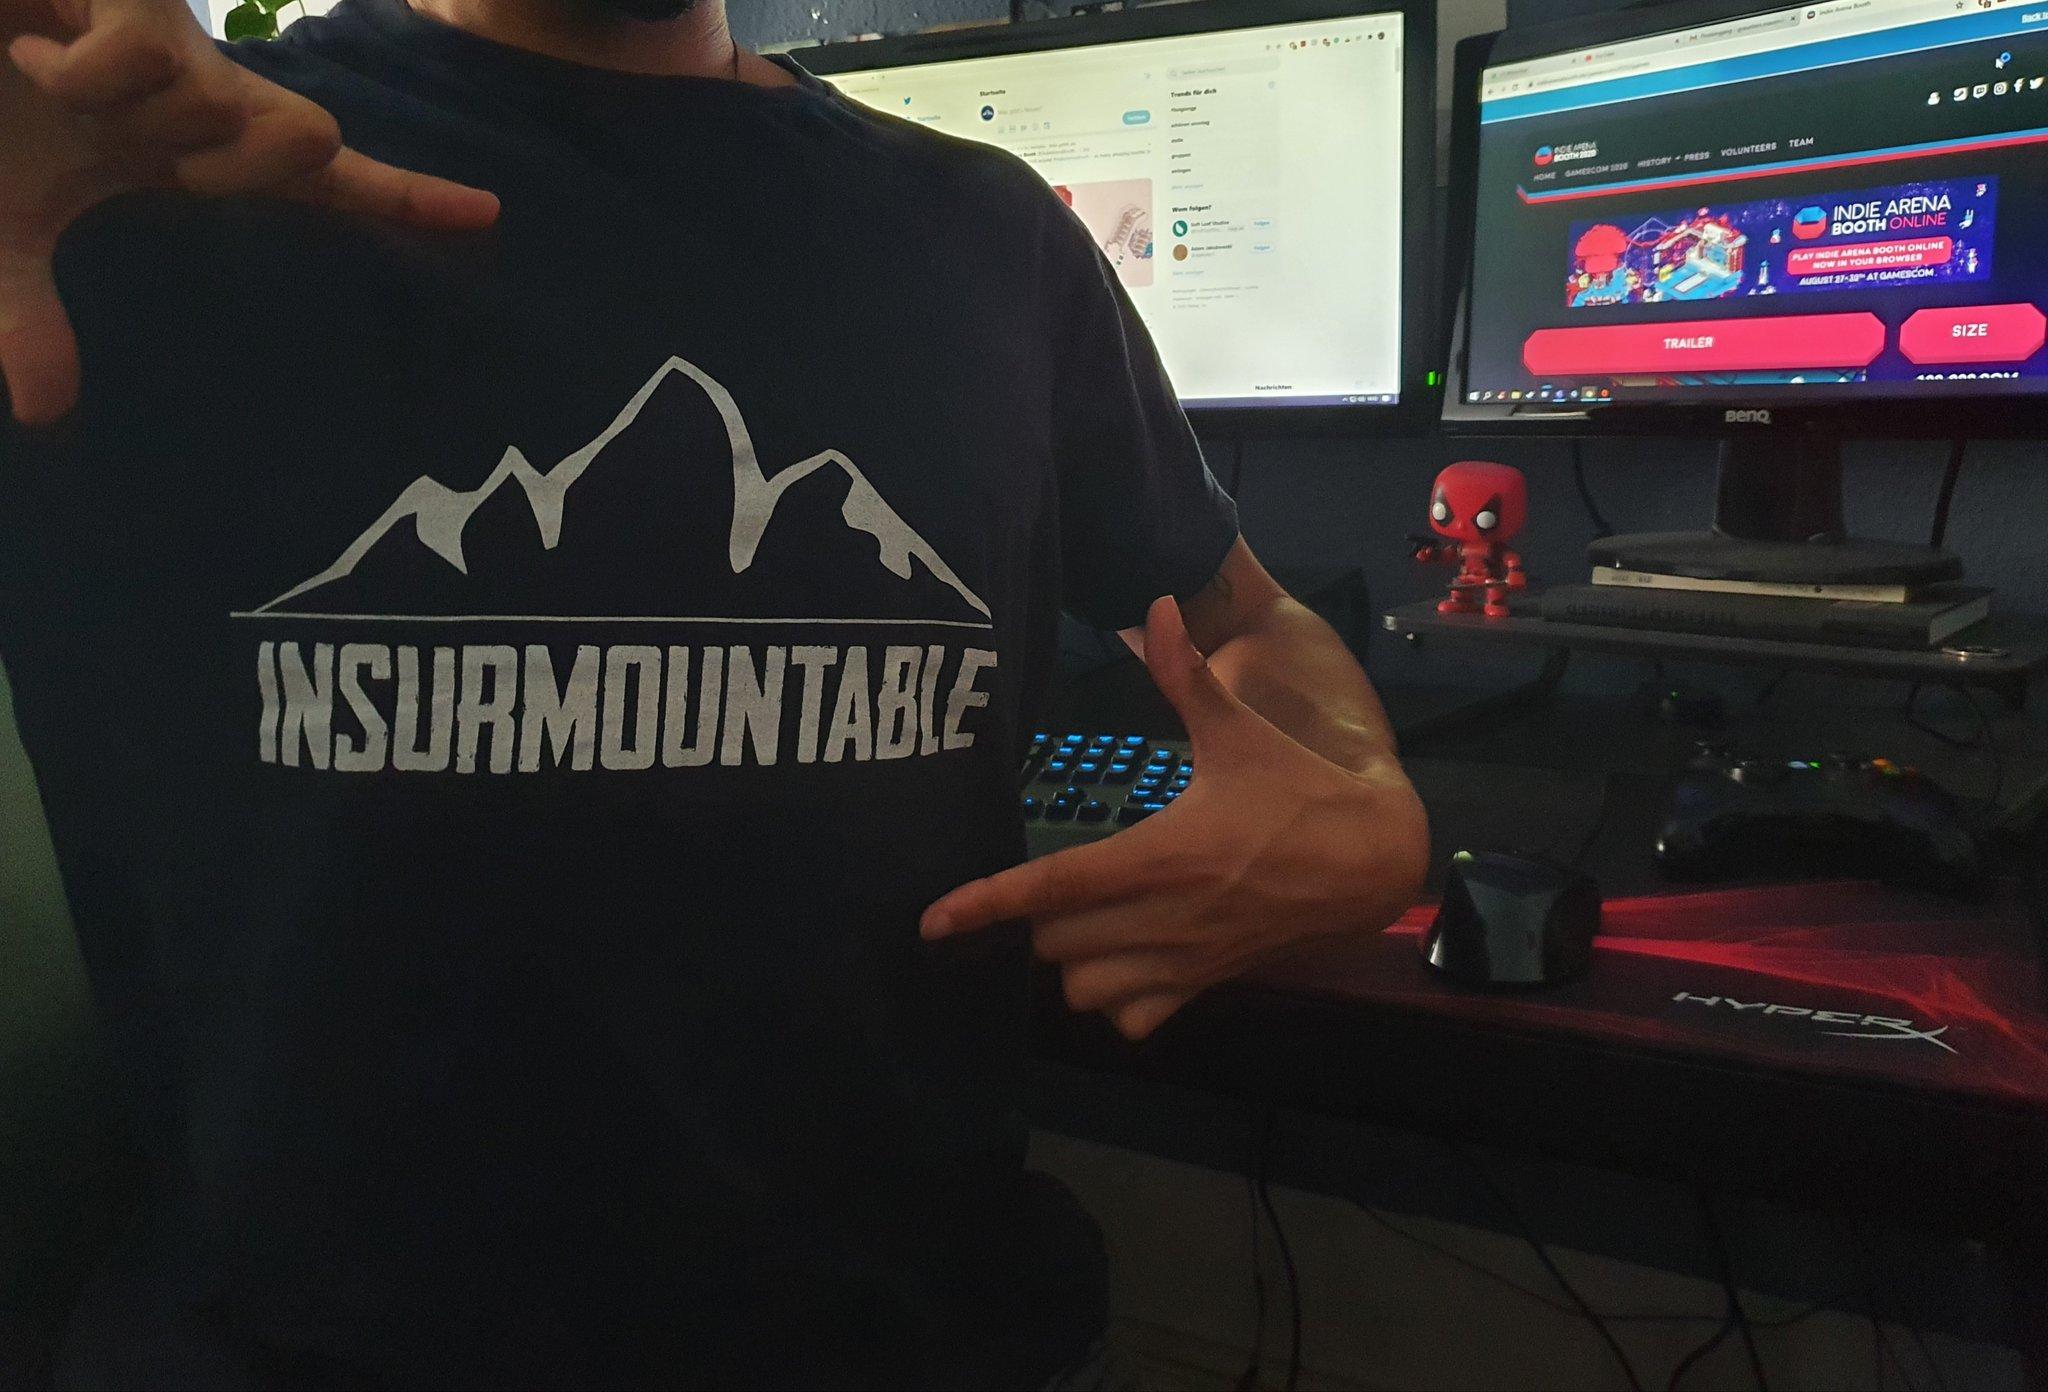 whole 4 days at gamescom